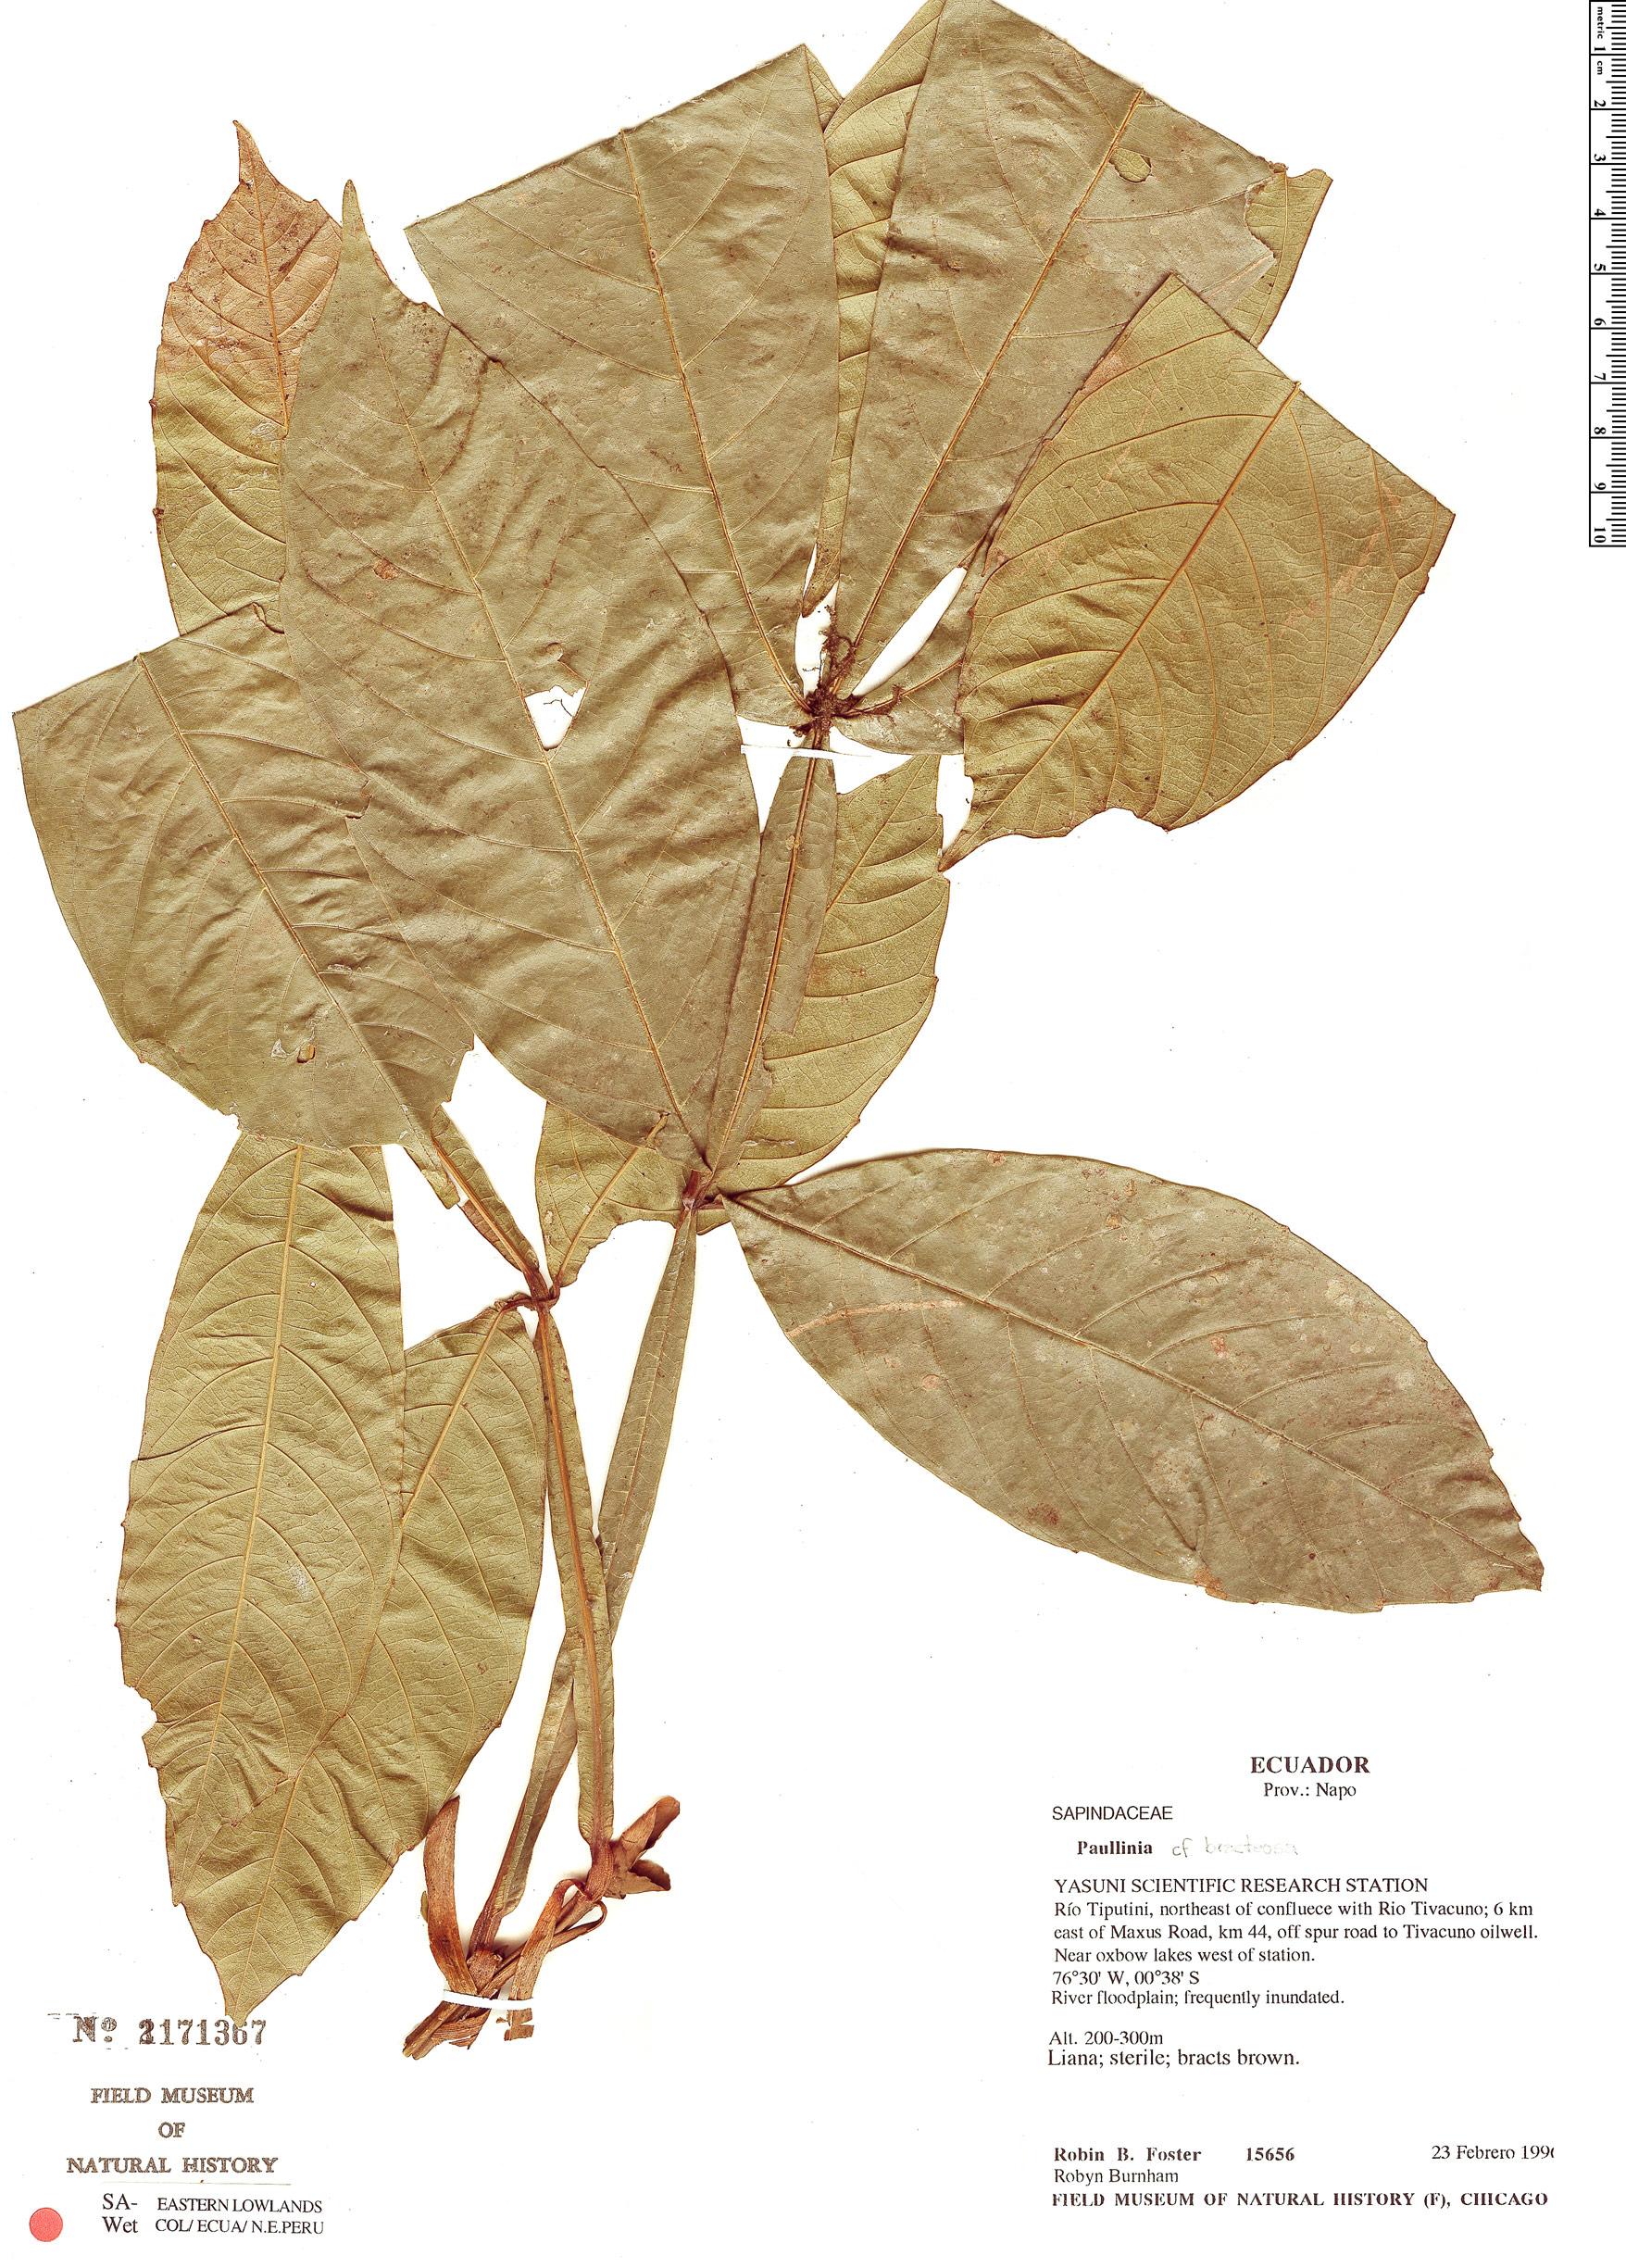 Specimen: Paullinia bracteosa